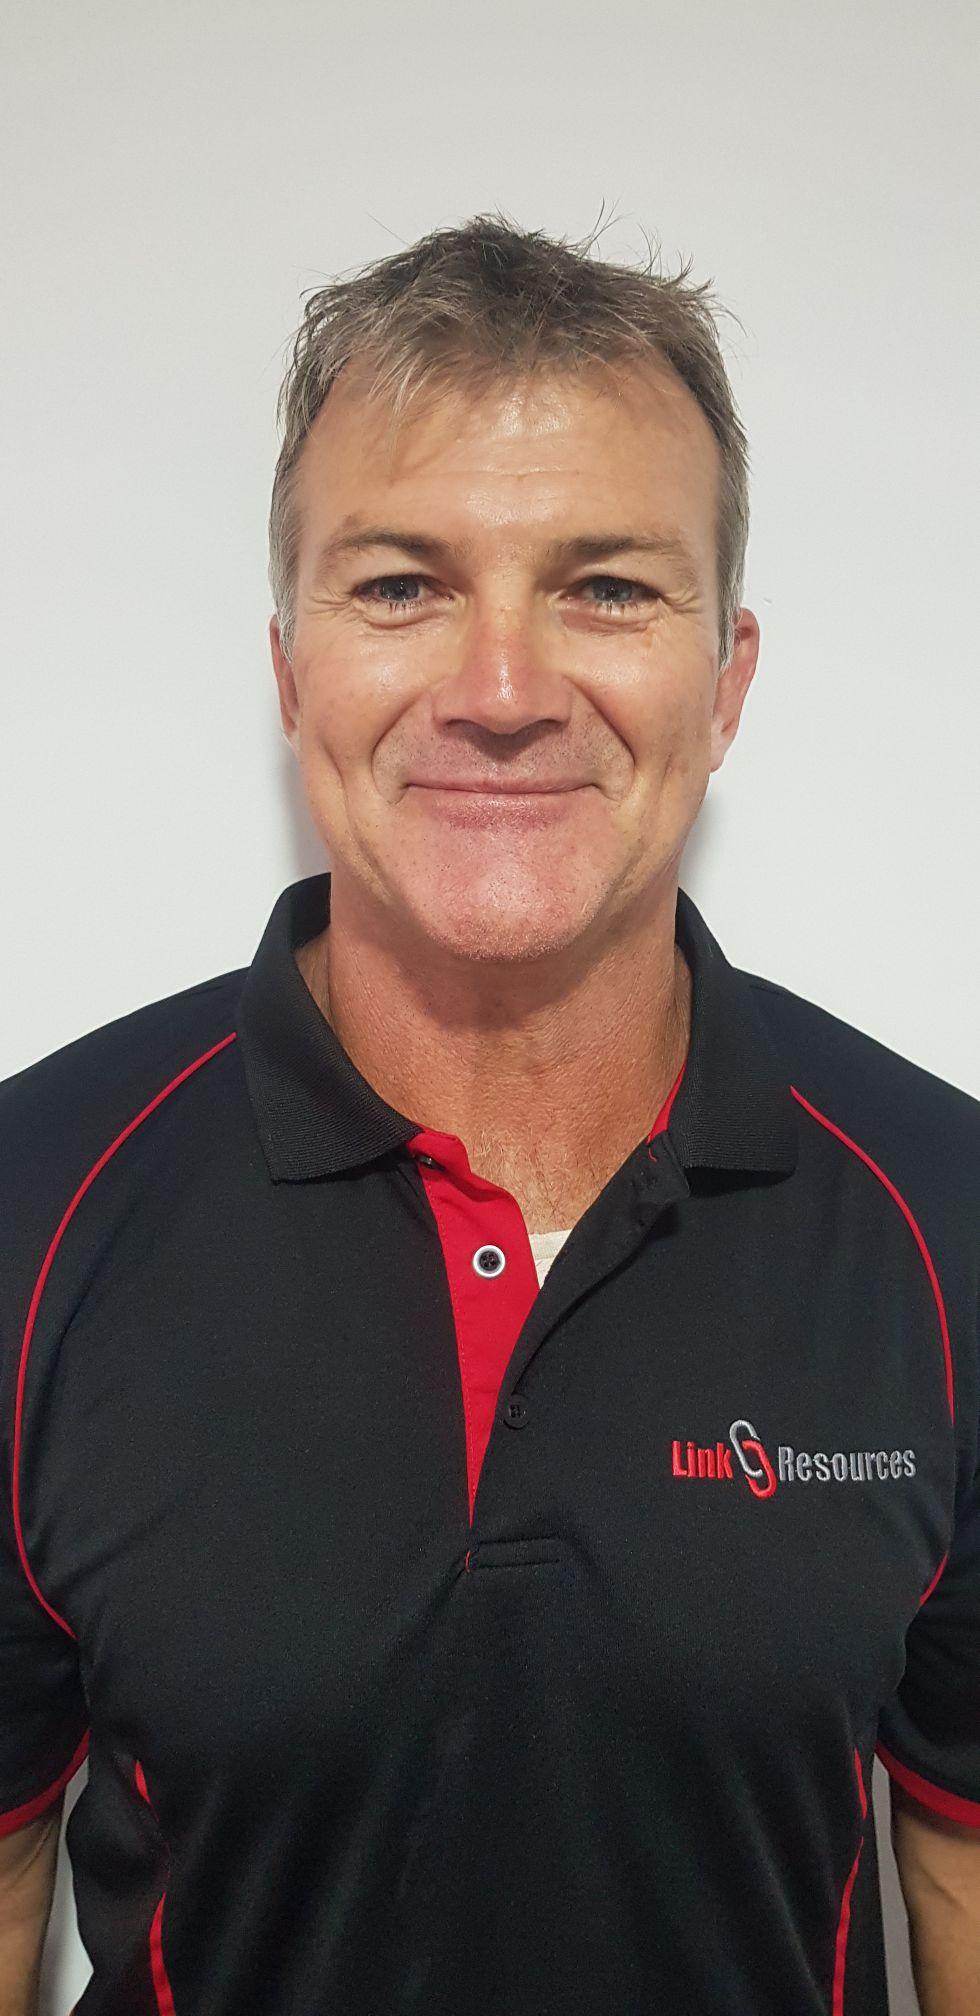 Wayne Hooper